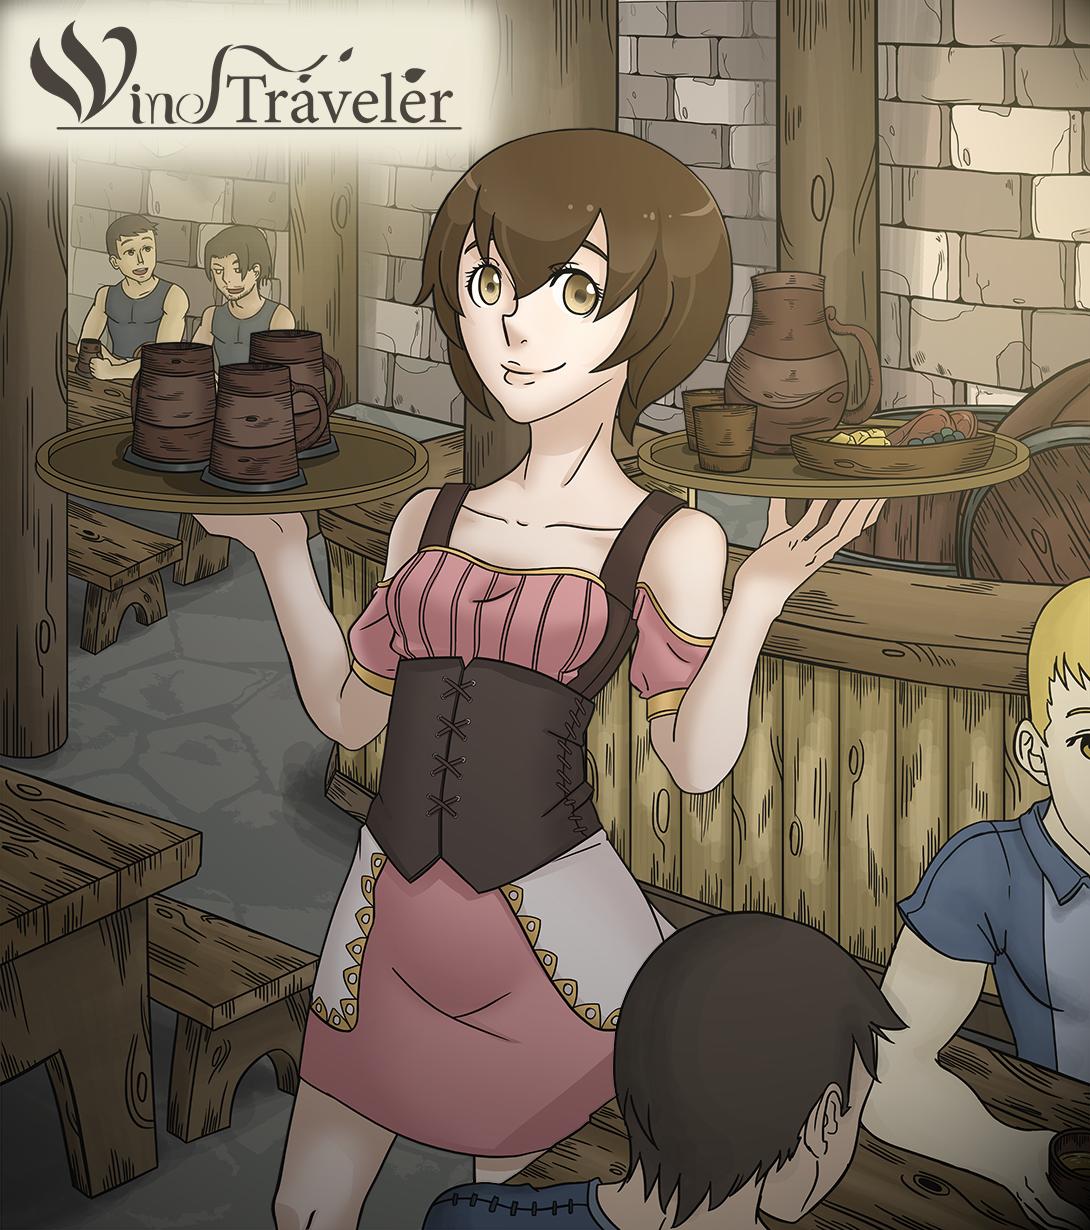 Wind Traveler Poster